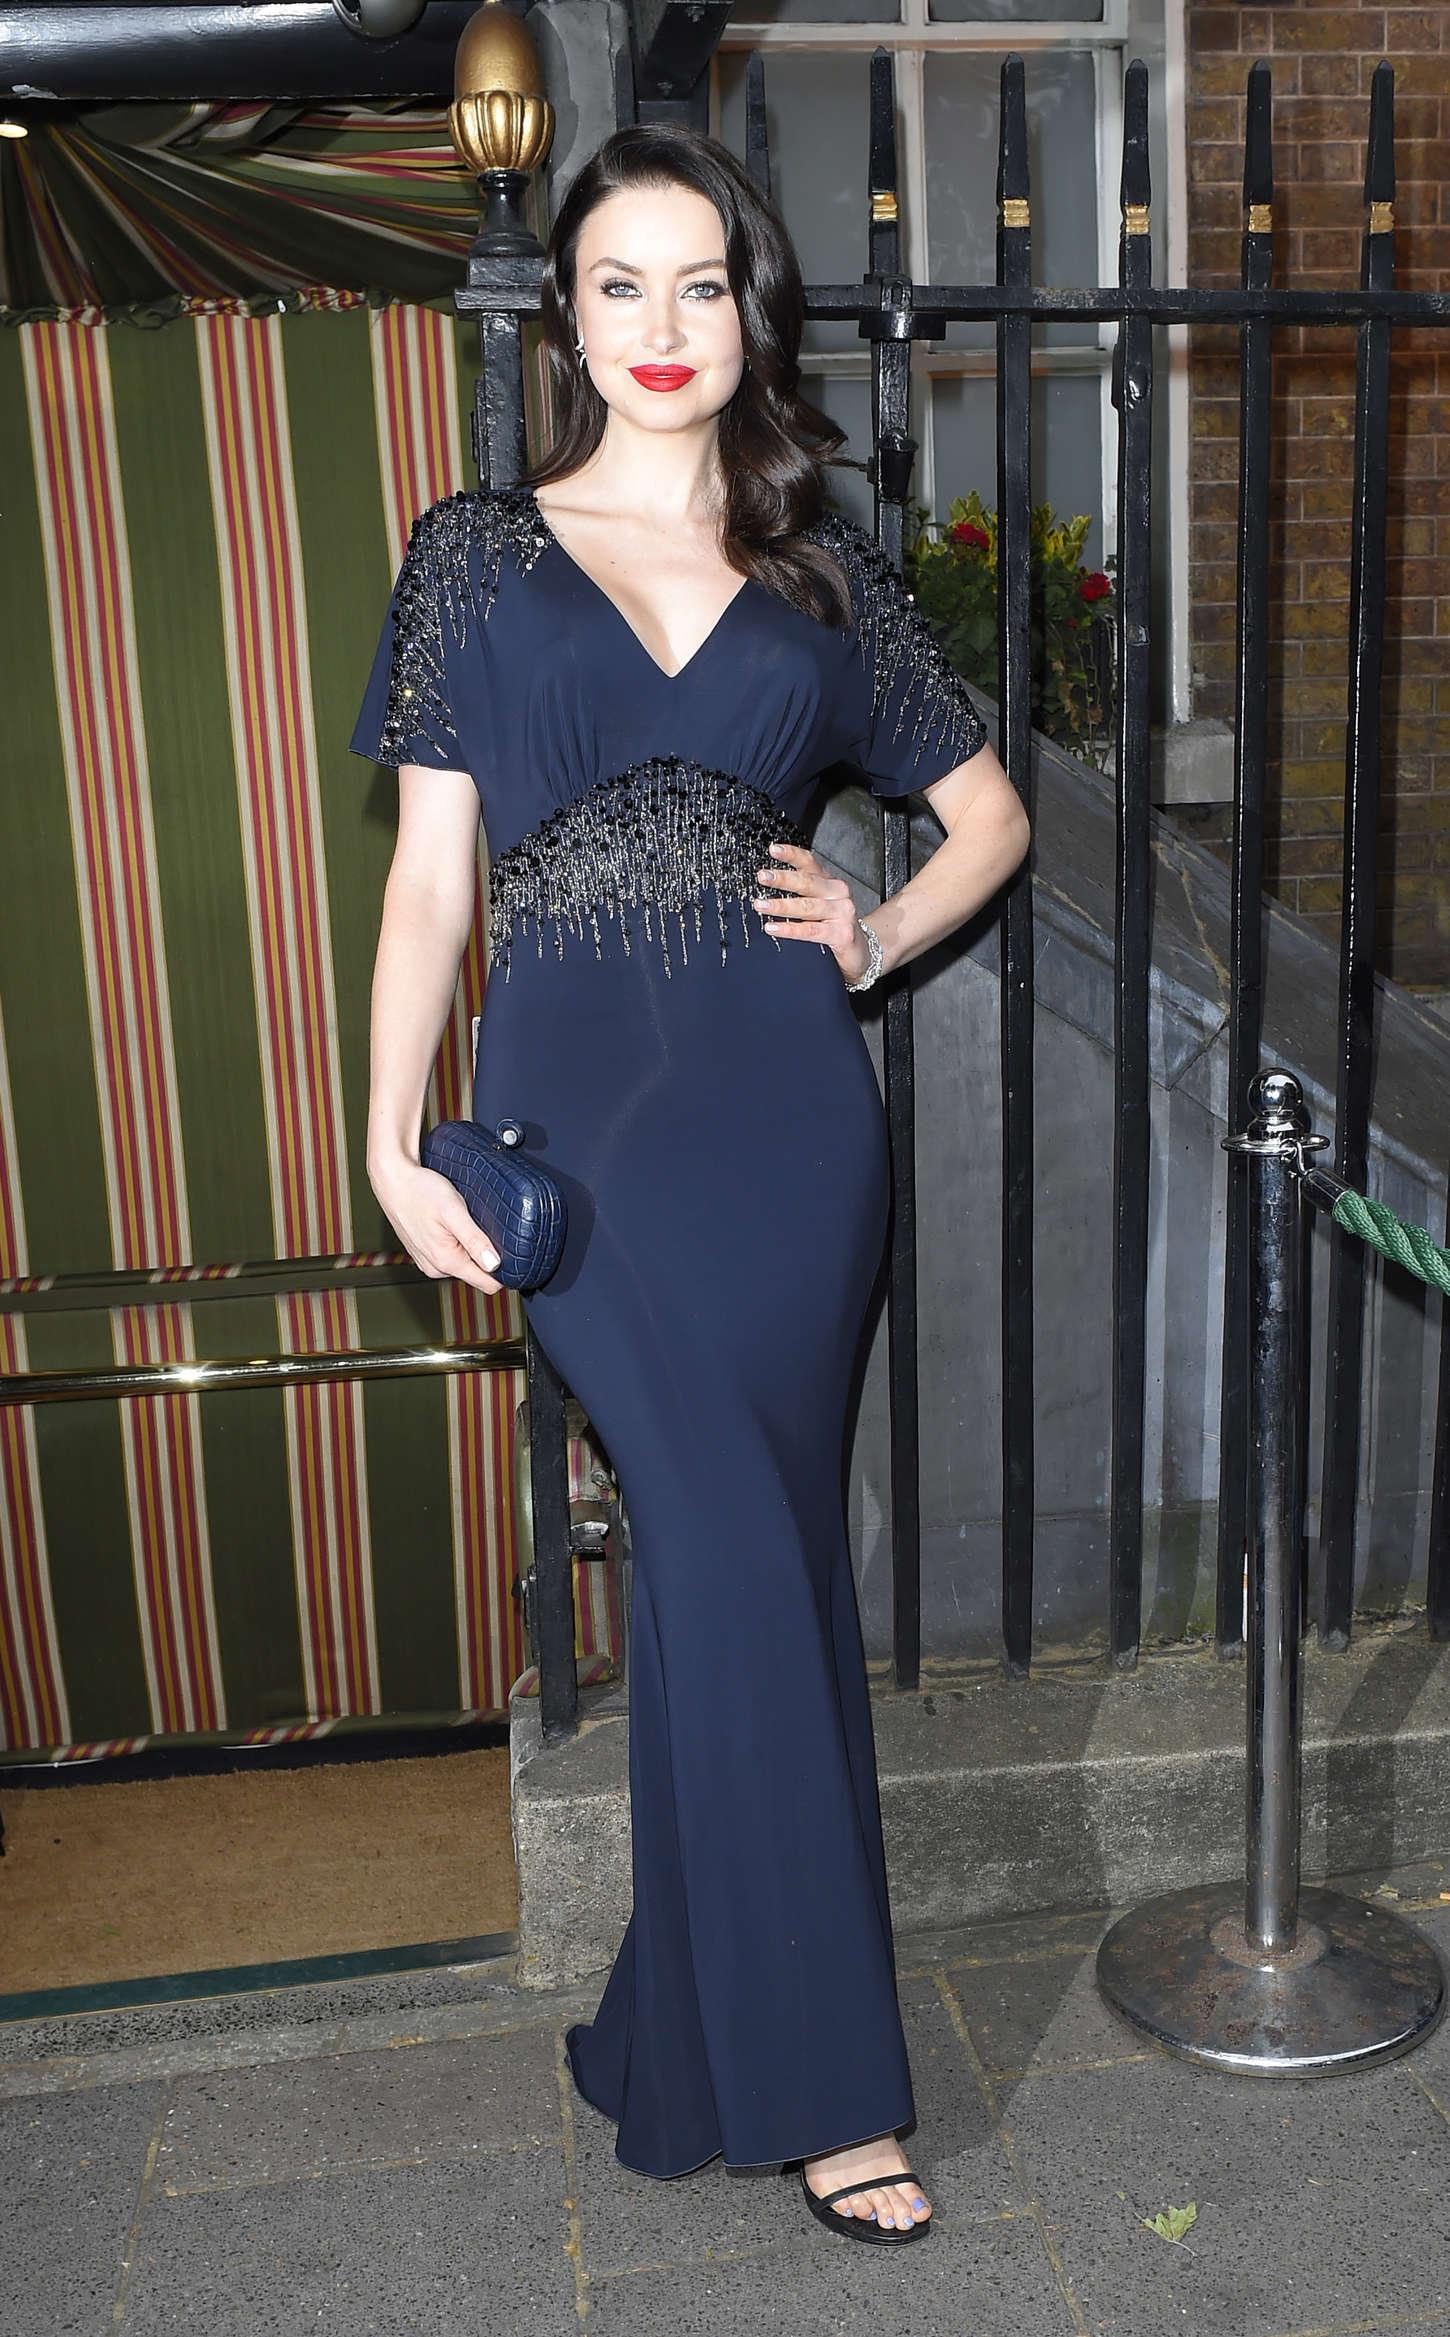 Emma Miller - 2015 Hawn Foundation UK Fundraising Dinner in London